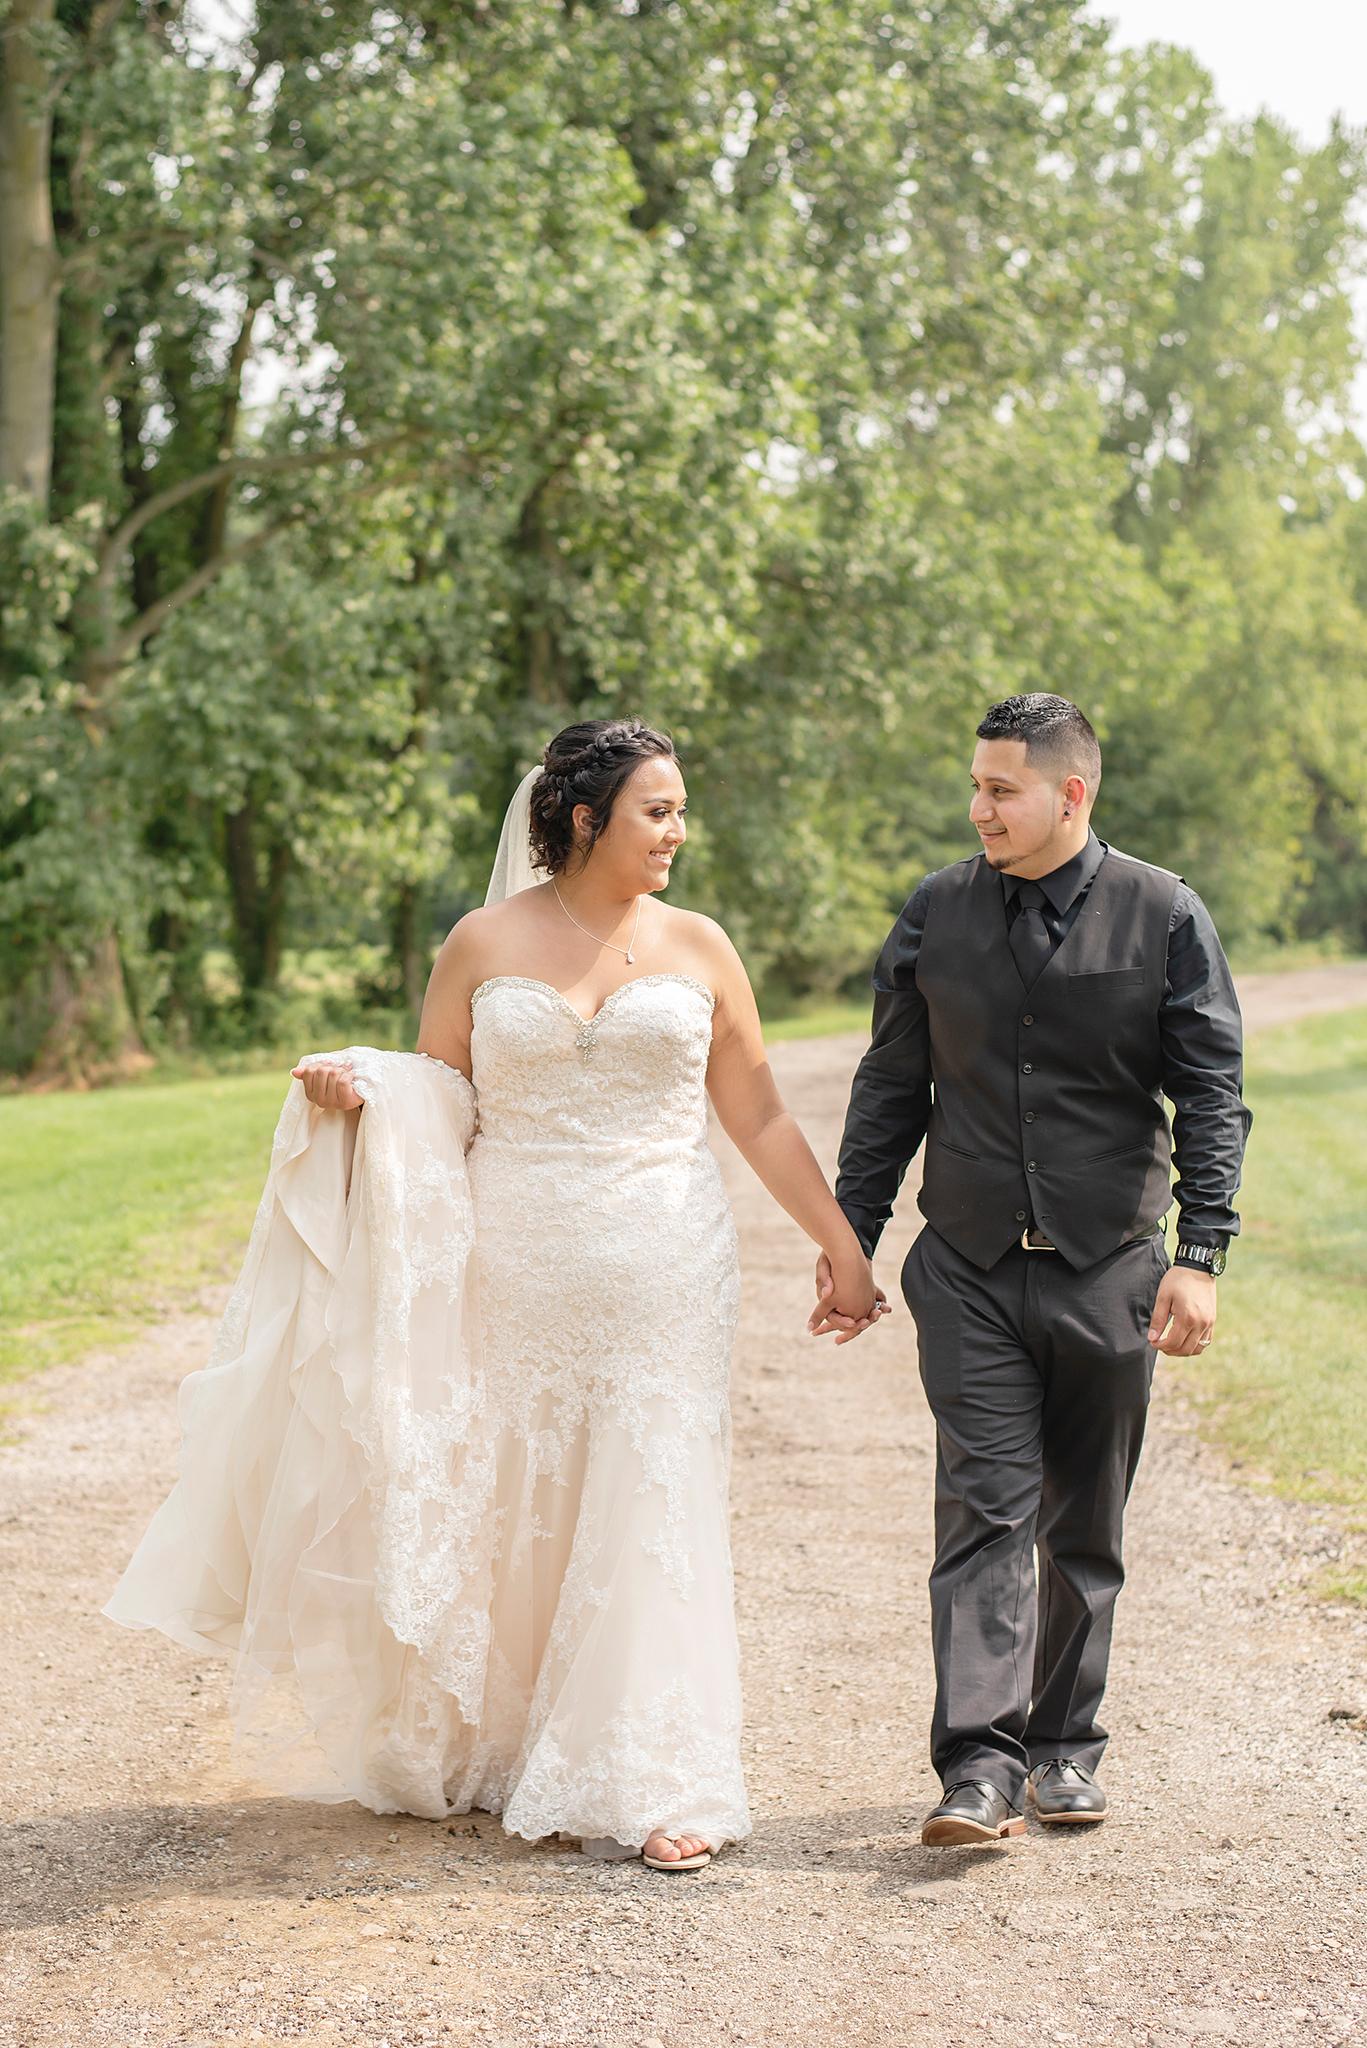 Lindsay-Adkins-Photography-Michigan-Wedding-Photographer-BernalBlog-13